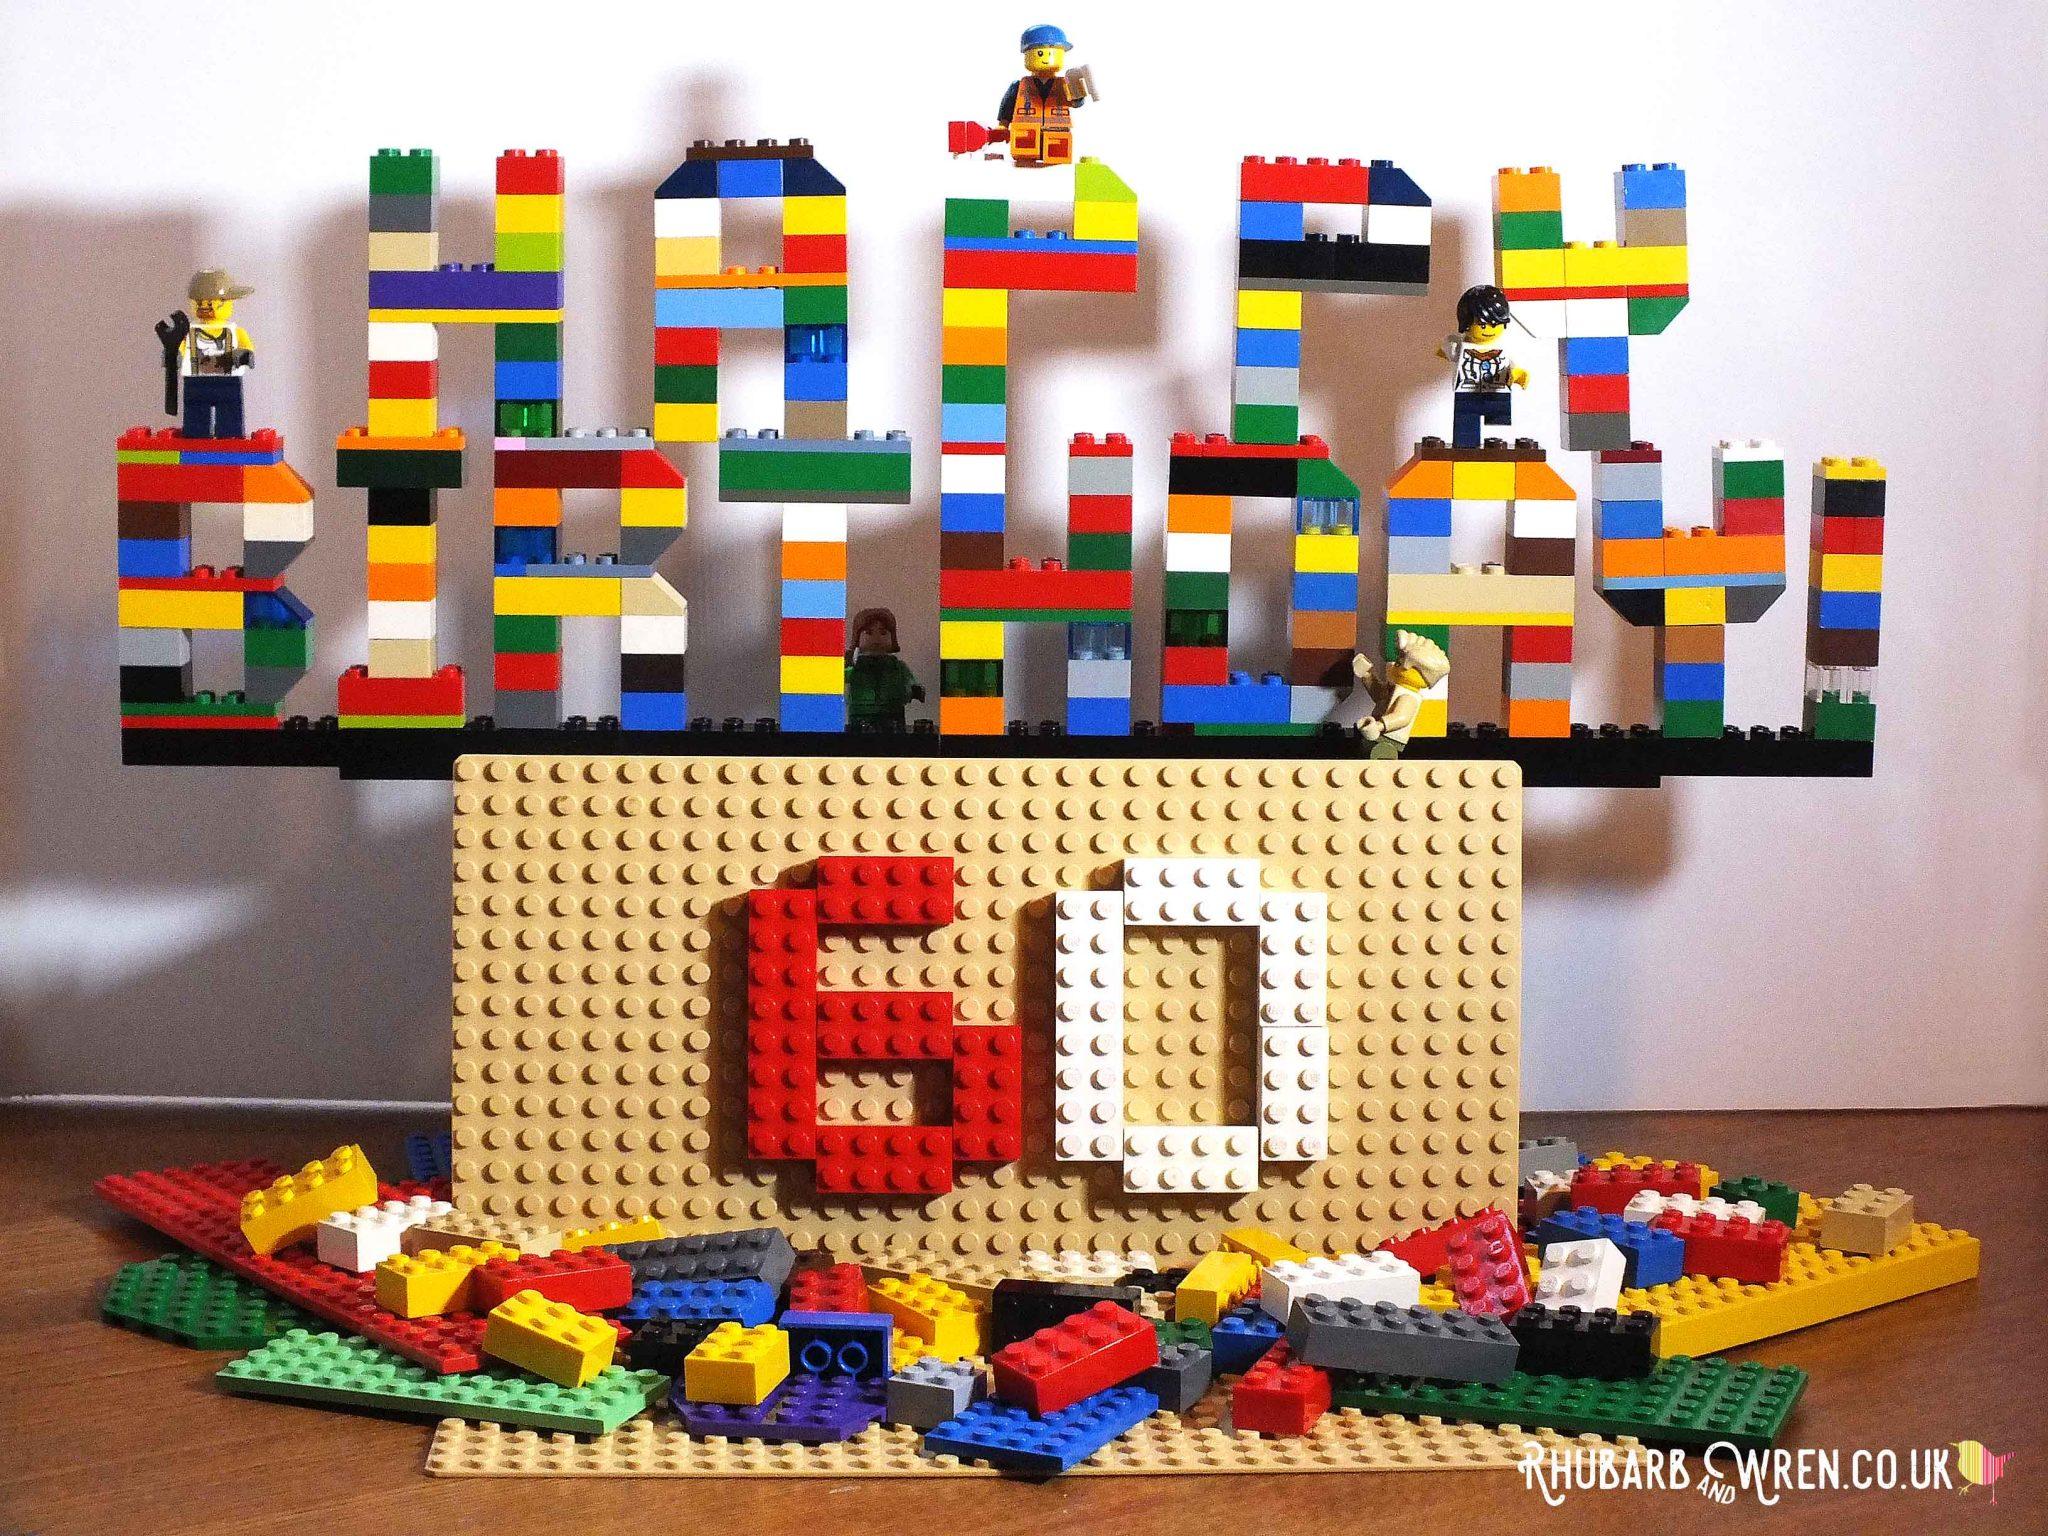 """Happy Birthday"" sign made of lego bricks"